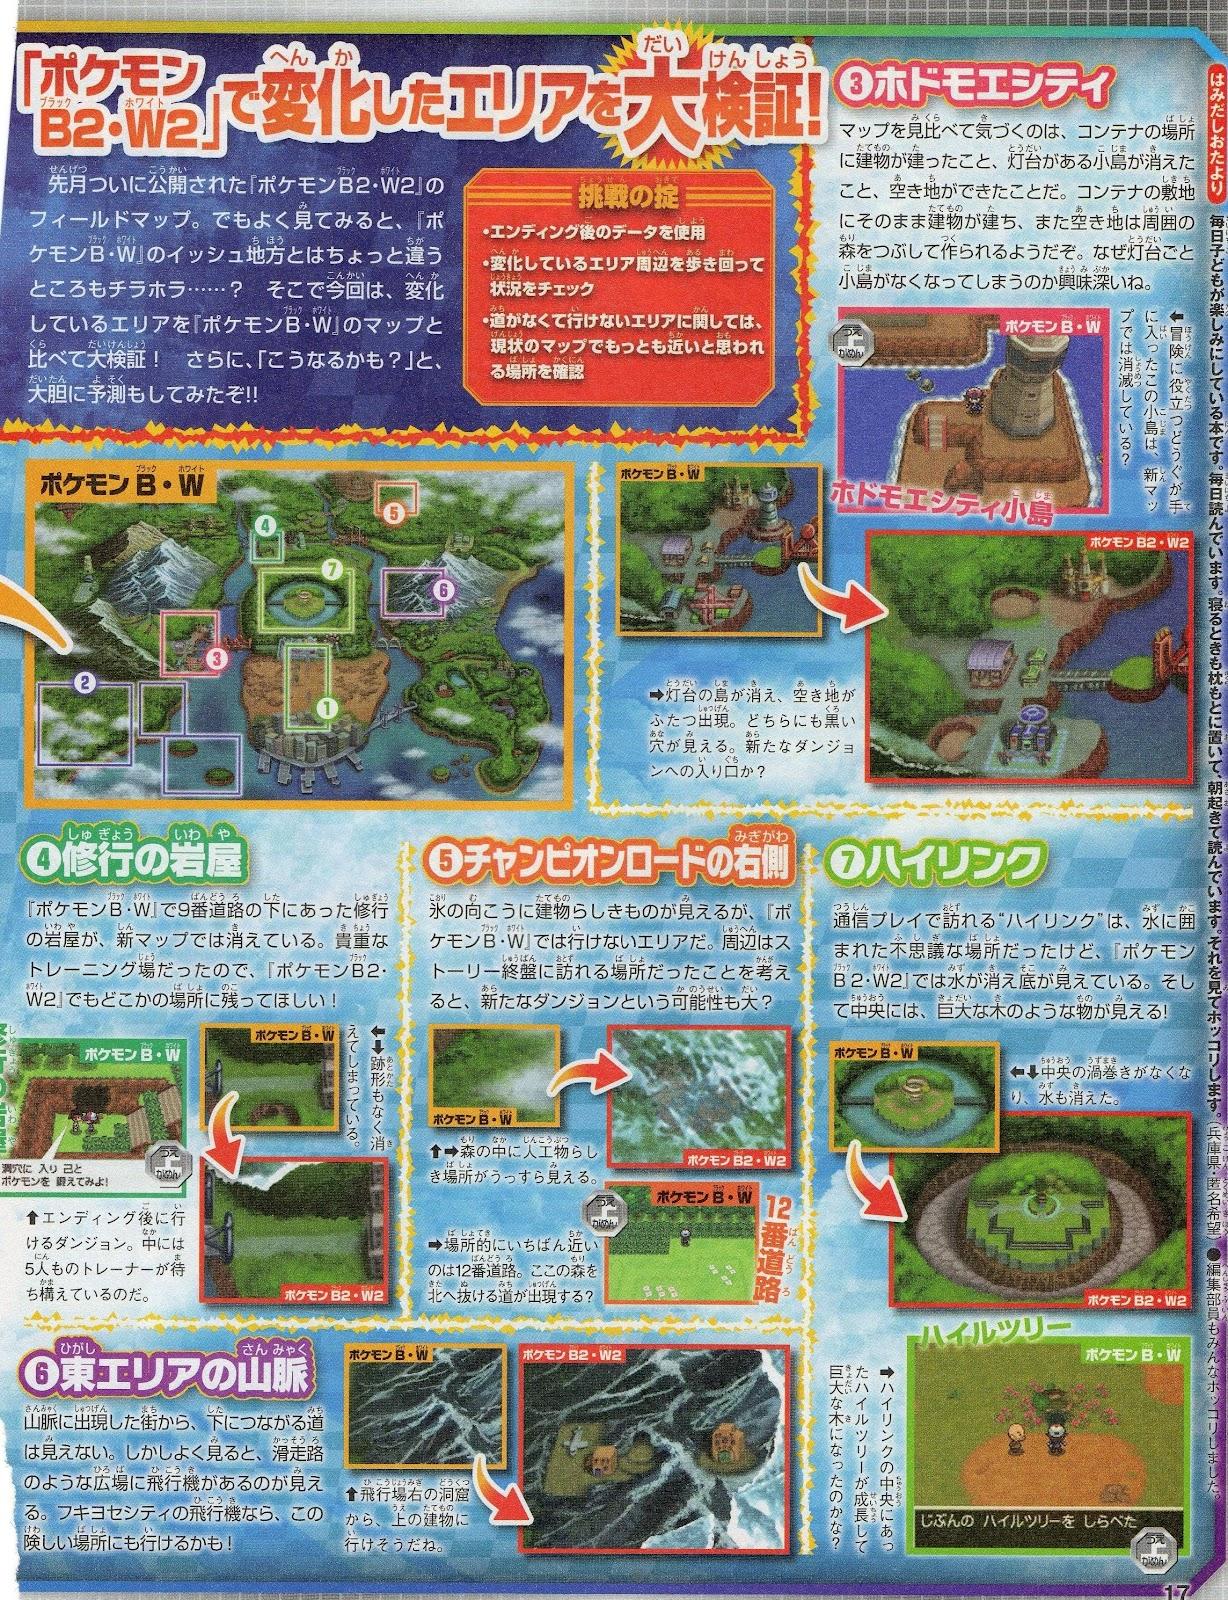 [Hilo Oficial] Pokemon Blanco/Negro 2 Famitsu_dswii_july_2012_pokemon_bw_bw2_map2